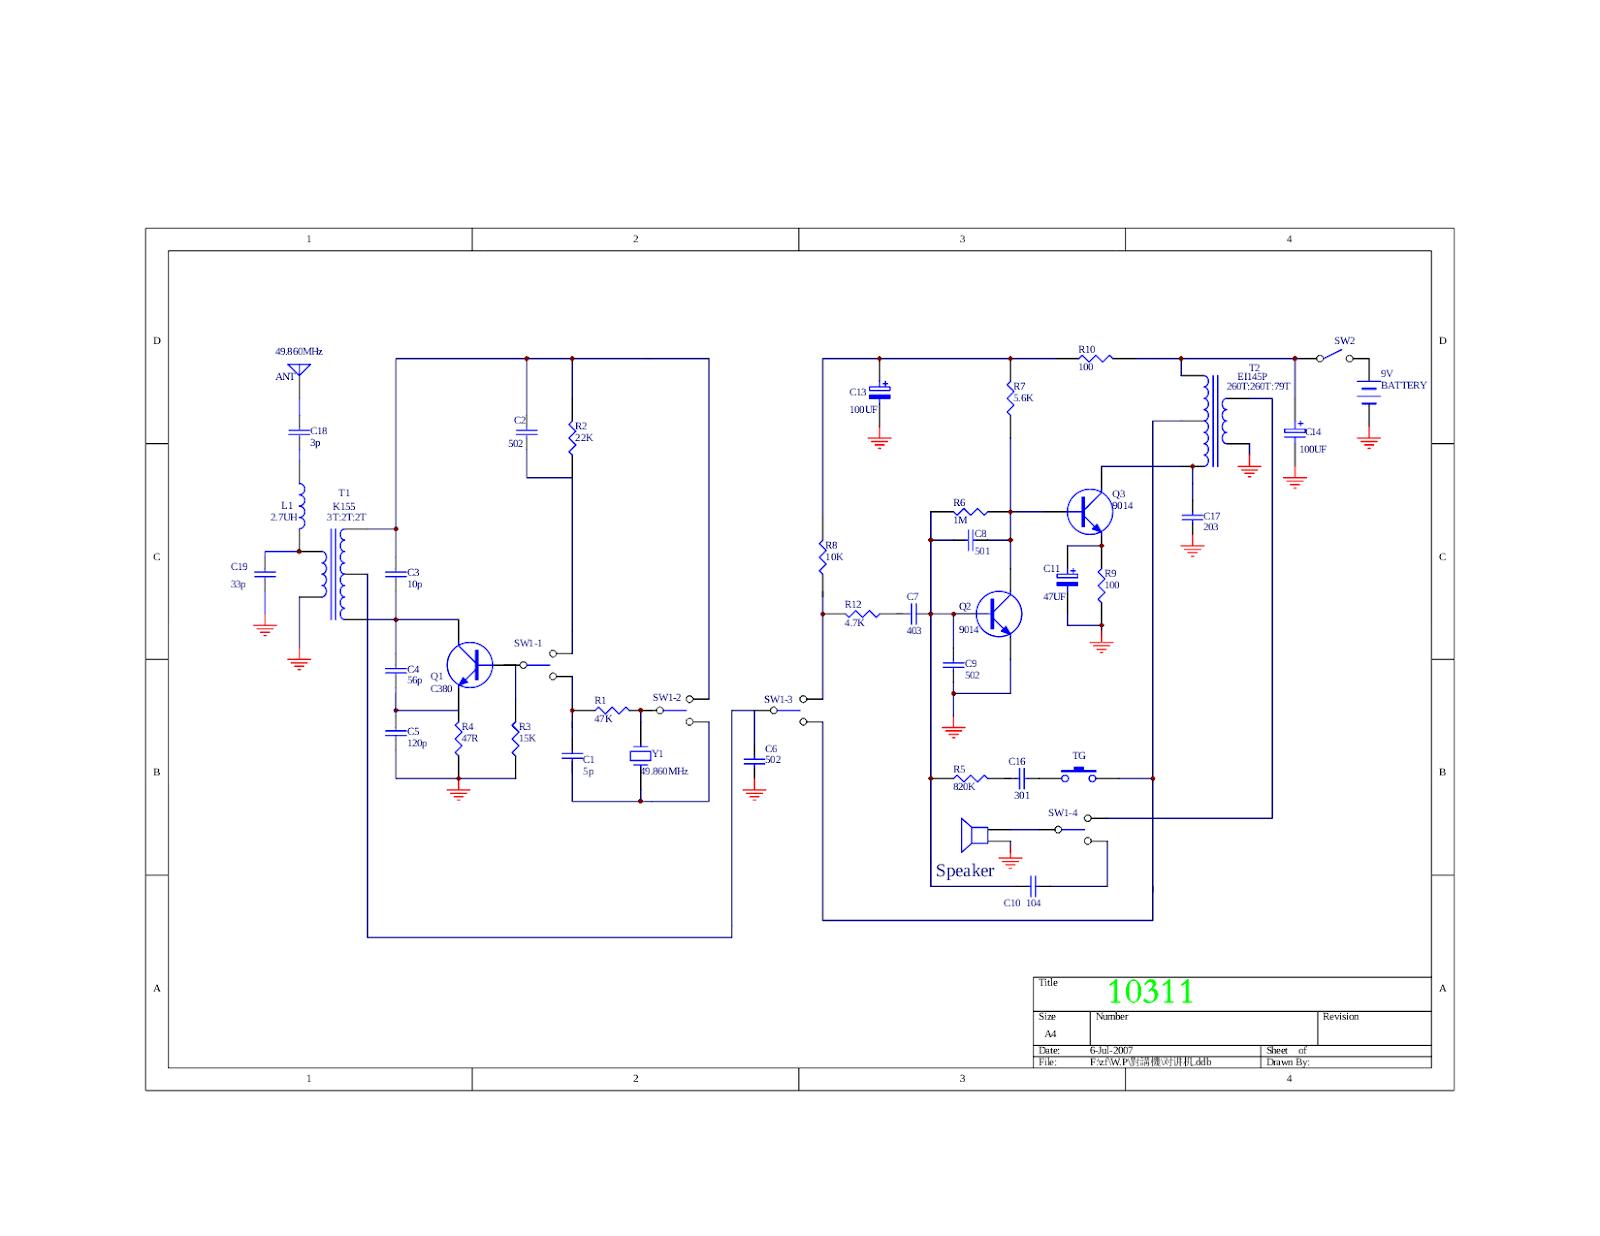 Elehob Voyager 1 Circuit Diagram